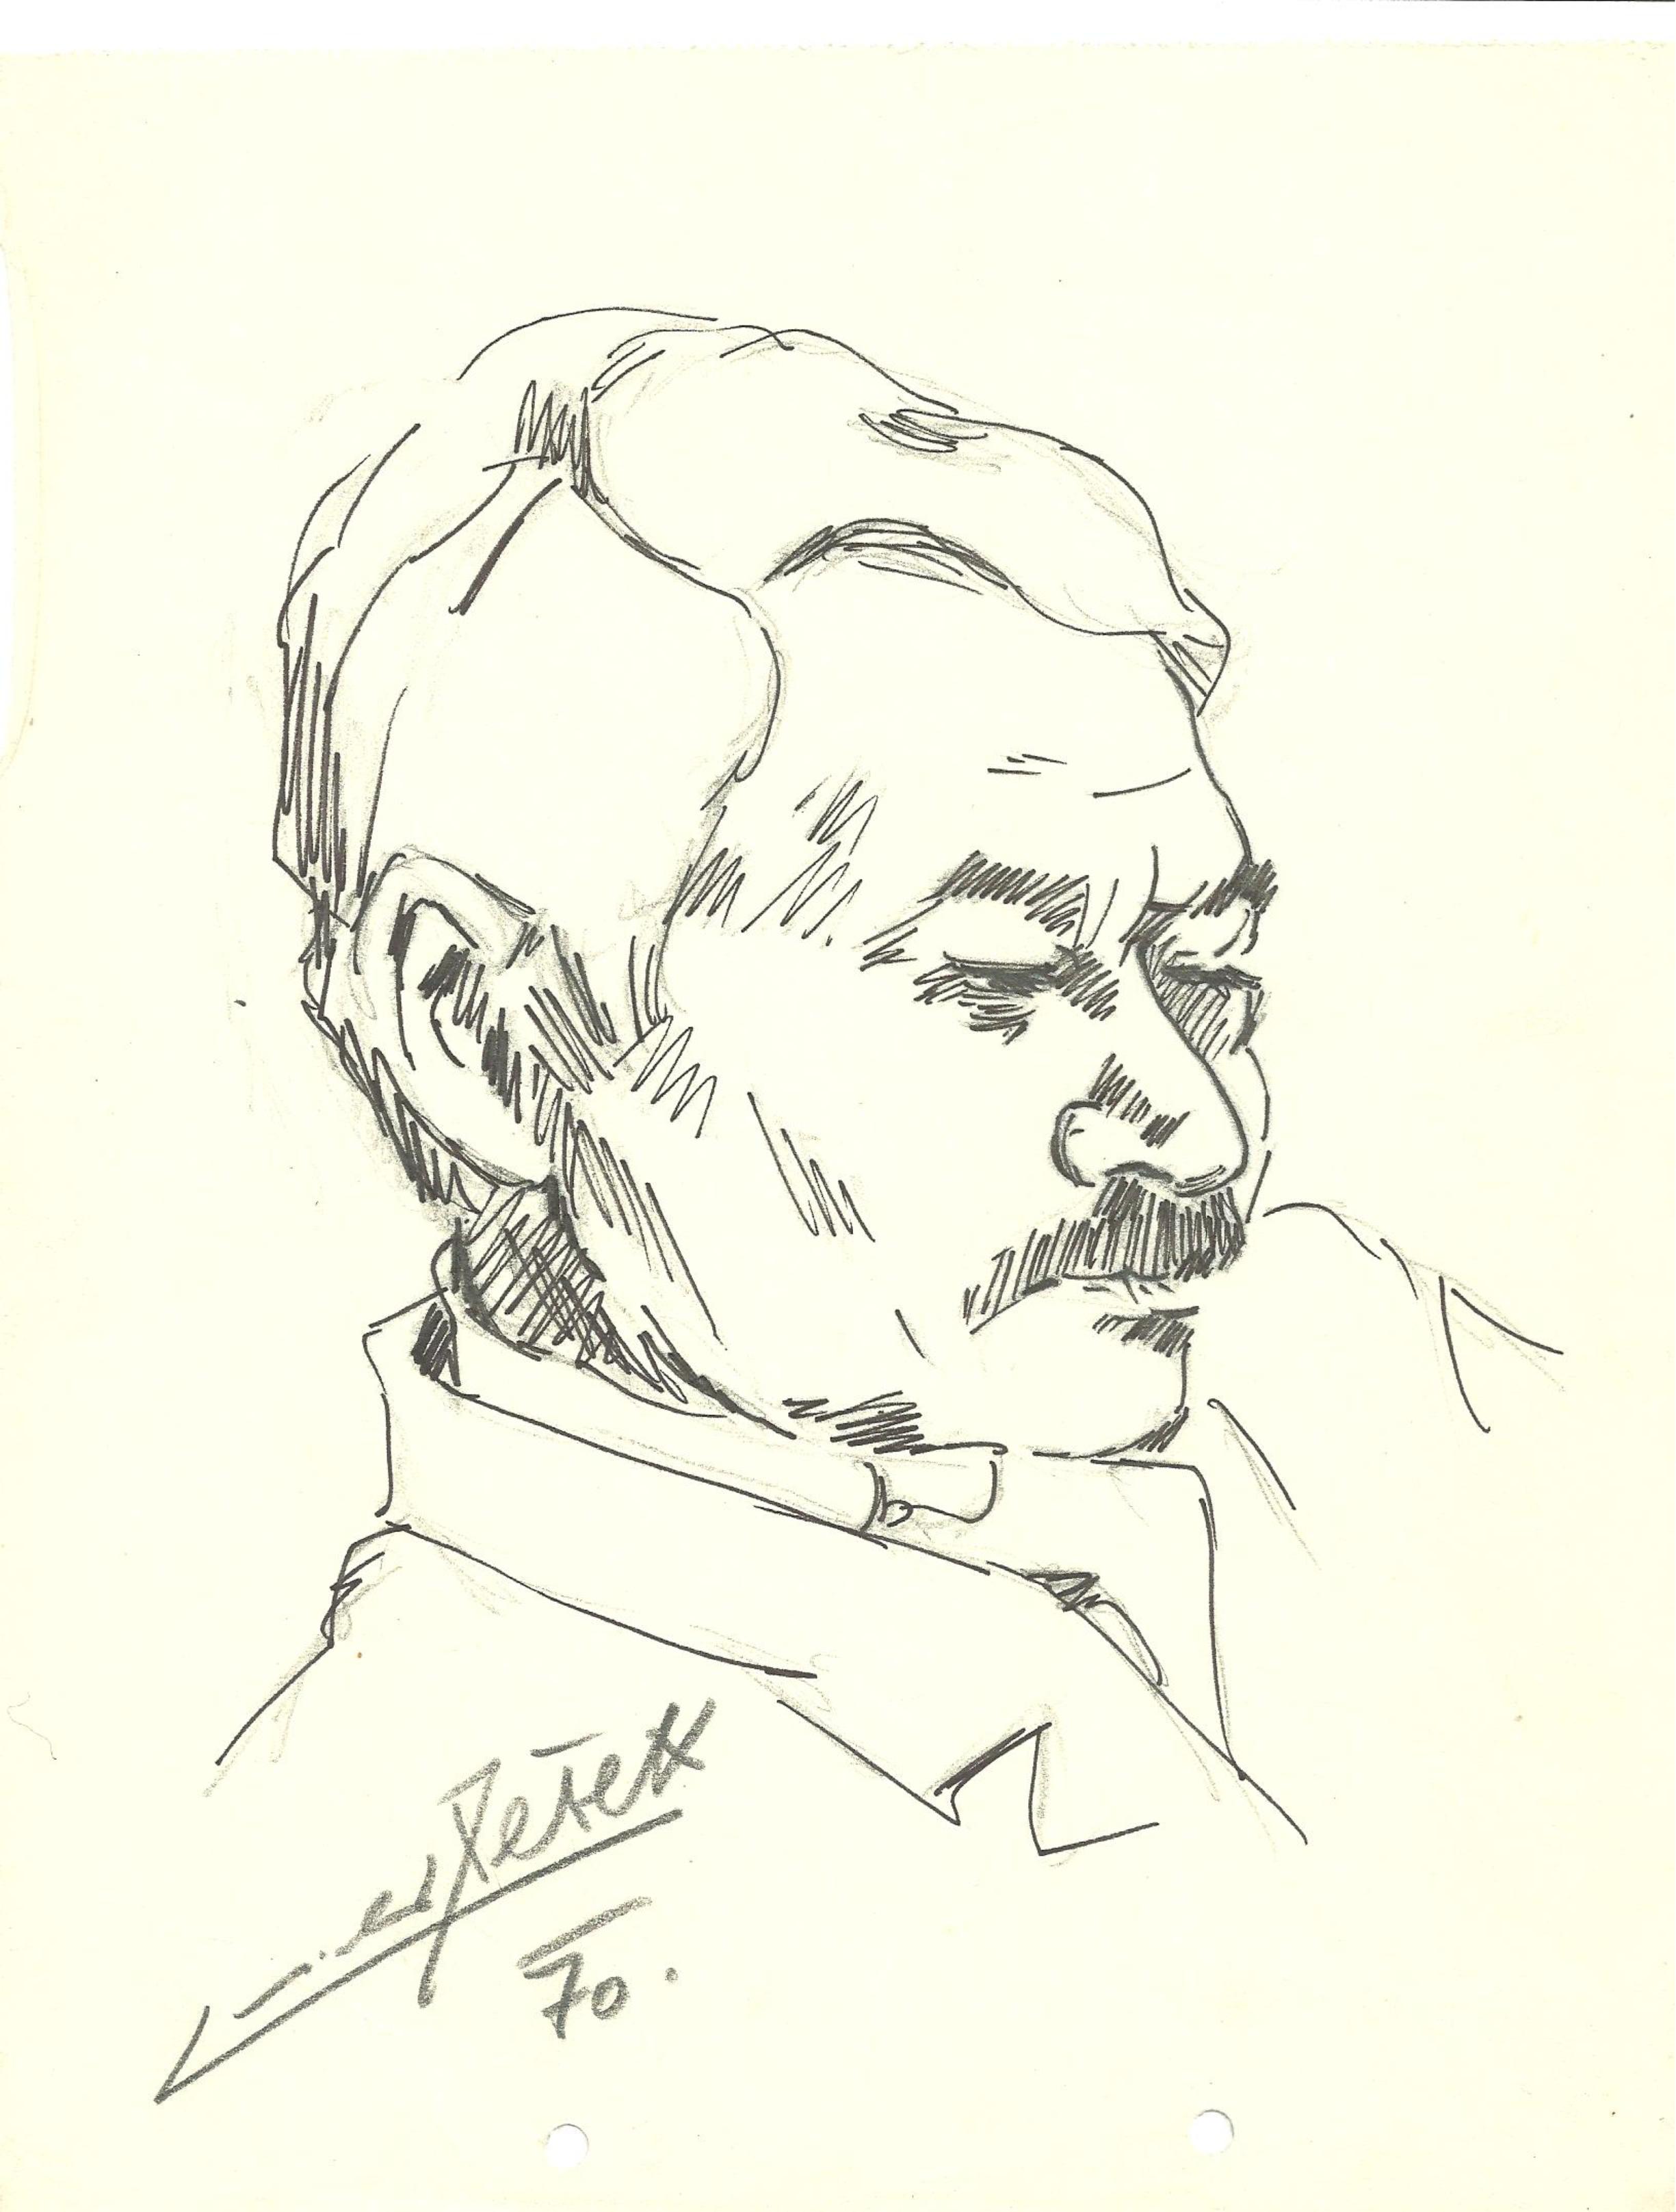 Herec Ladislav Pešek